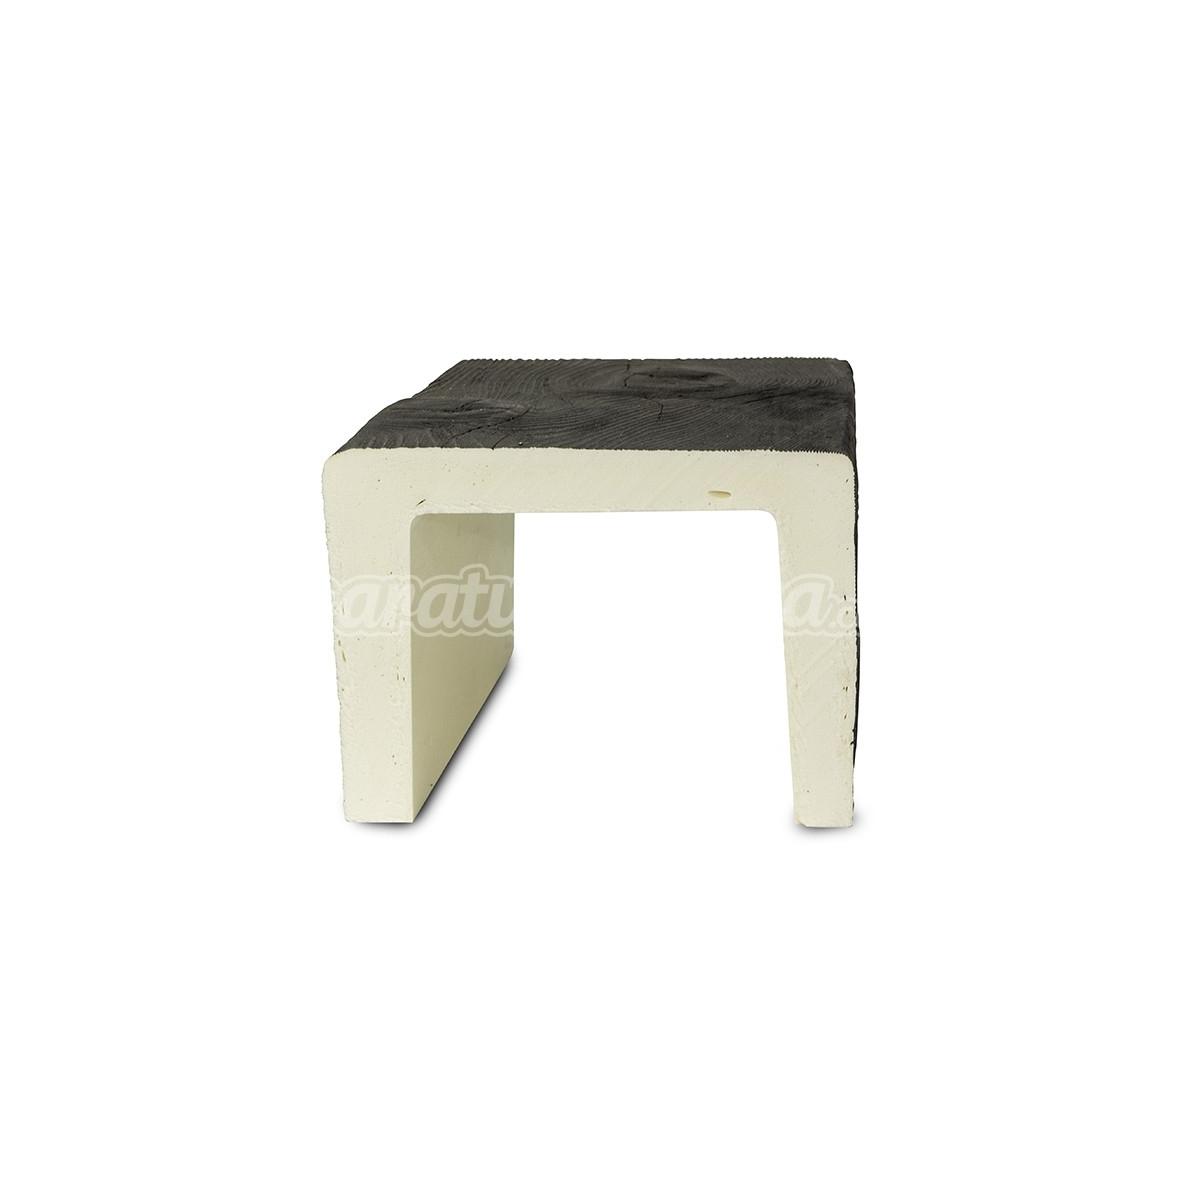 Grupo Unamacor Viga 300x22,5x17,5 imitación madera